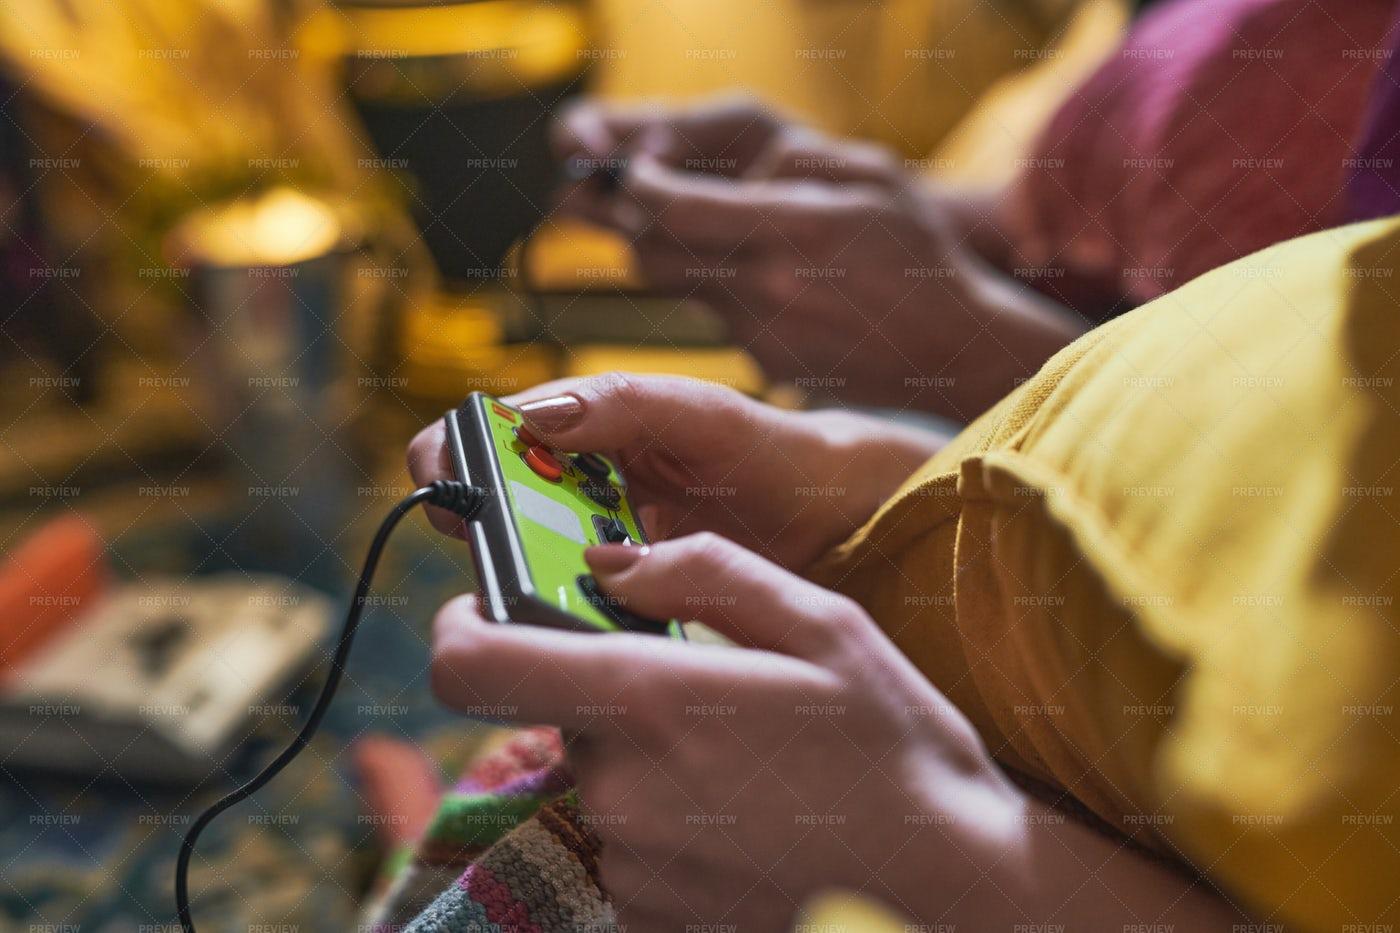 Woman Playing With A Joystick: Stock Photos